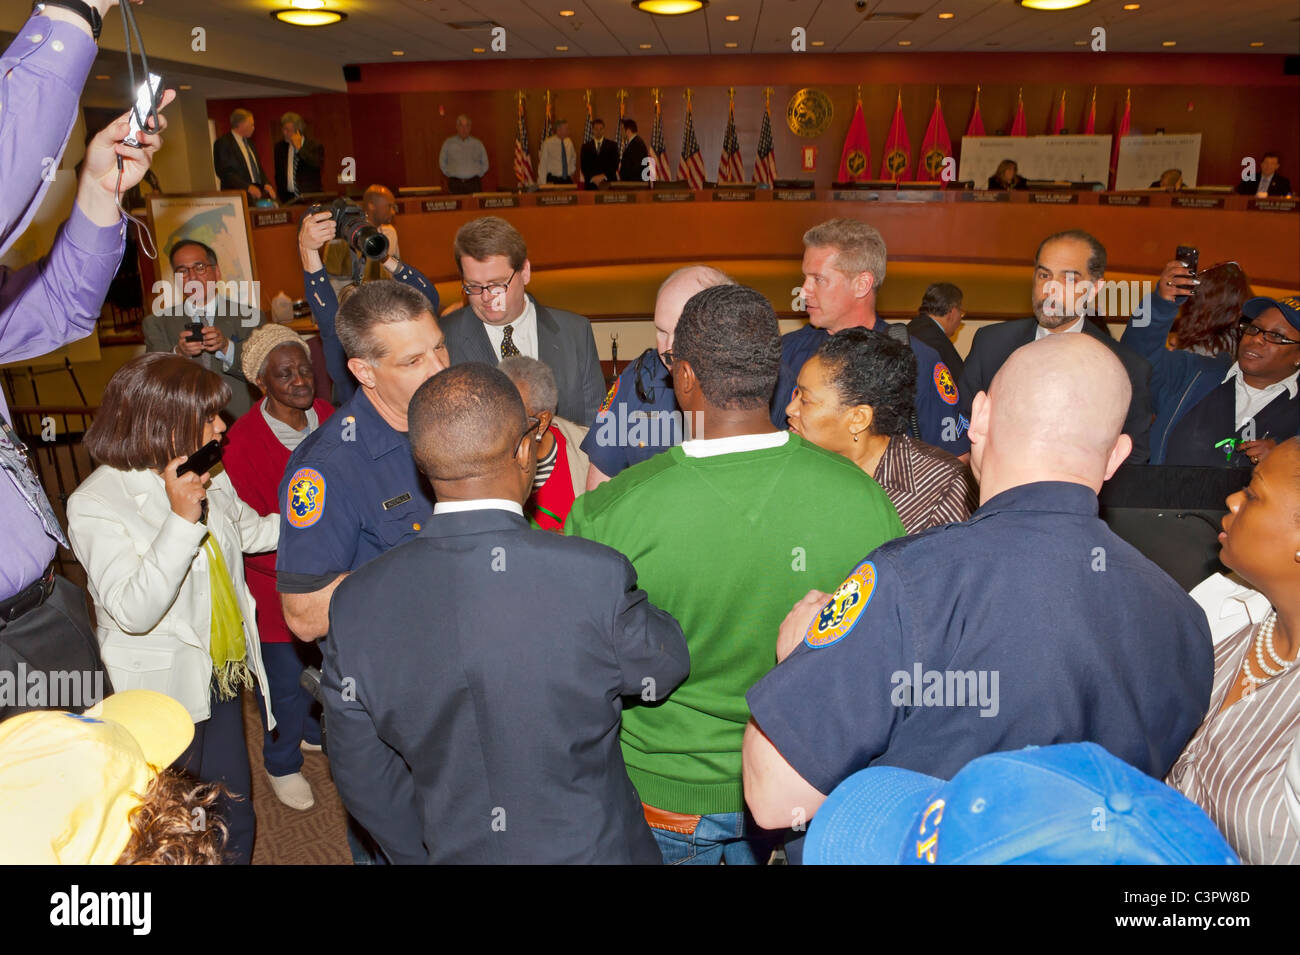 Nassau County Police Officers at disruption at Nassau County Legislative Redistricting Public Hearing, May 9, 2011, - Stock Image